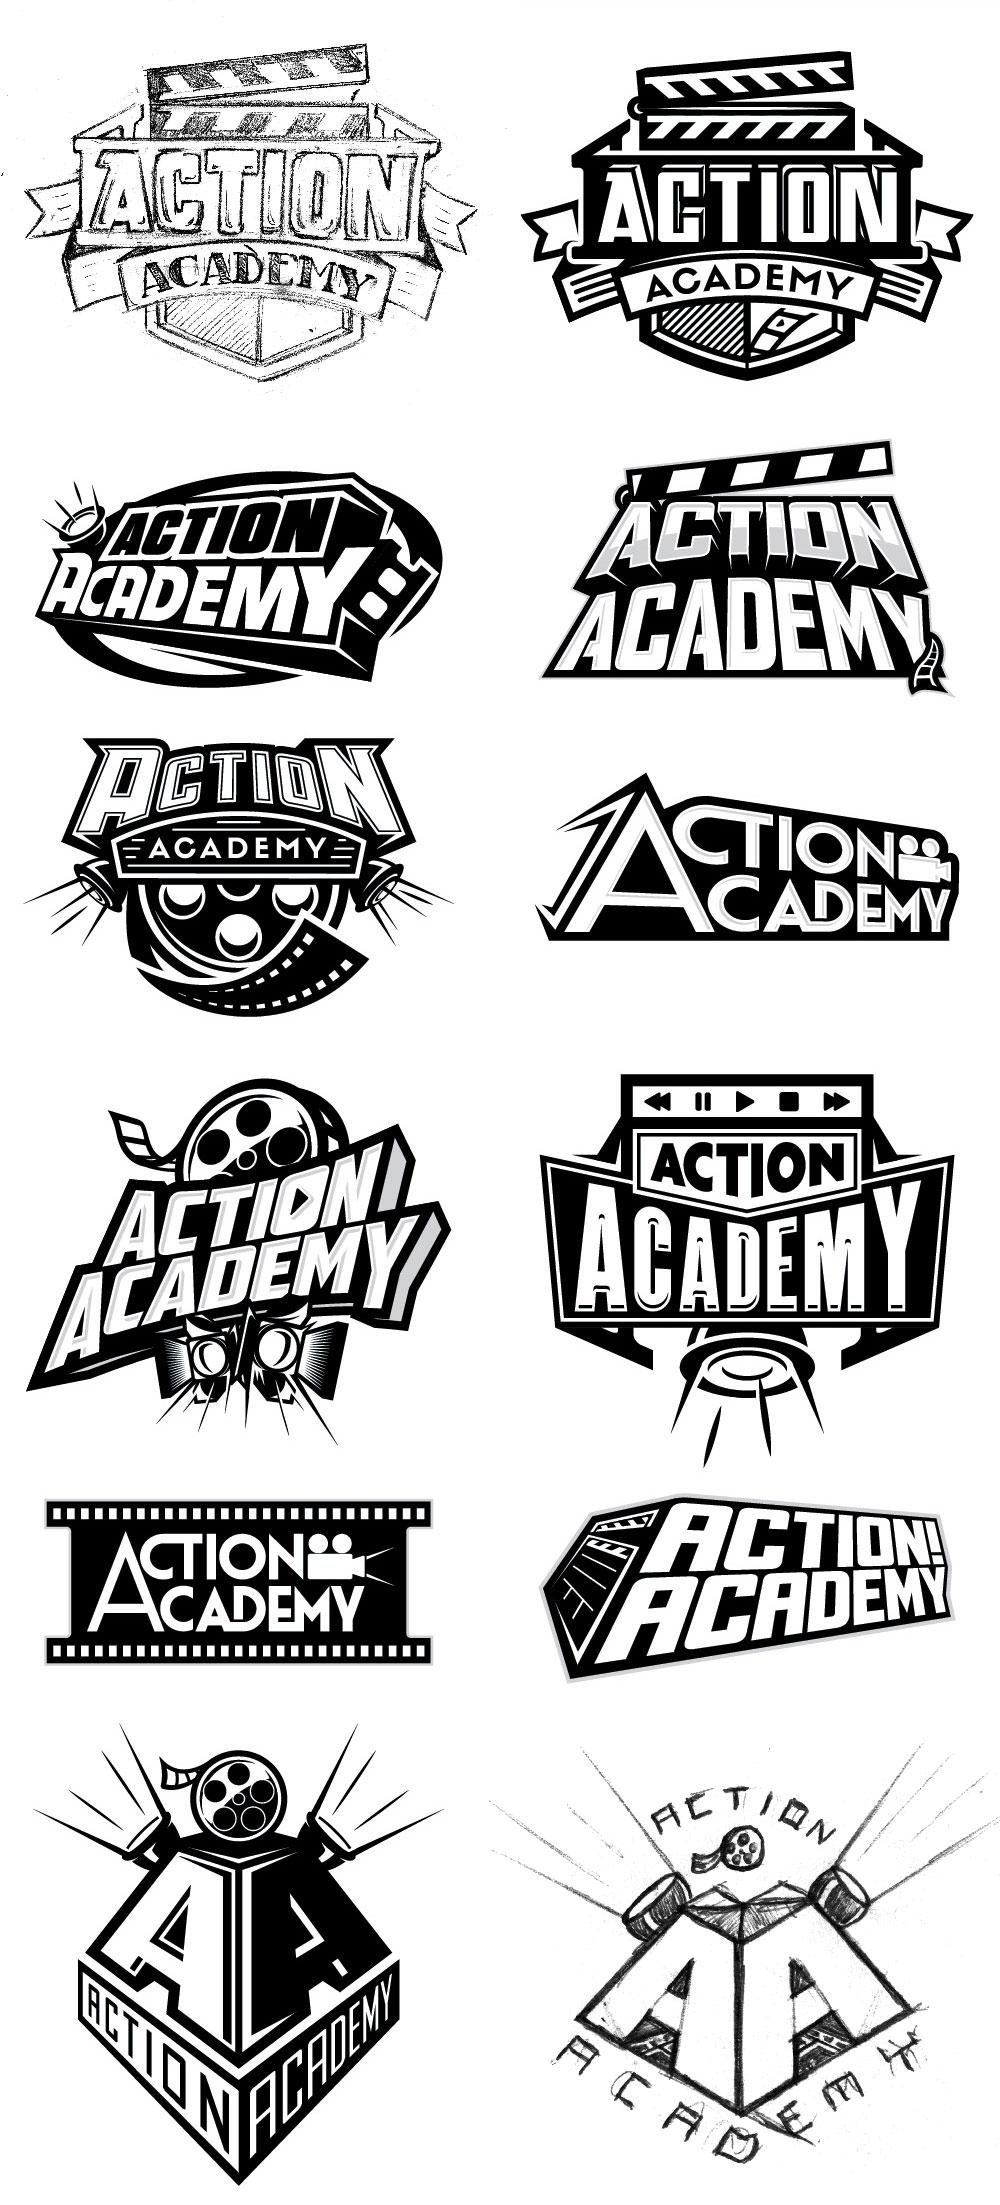 ActionAcademy_01.jpg